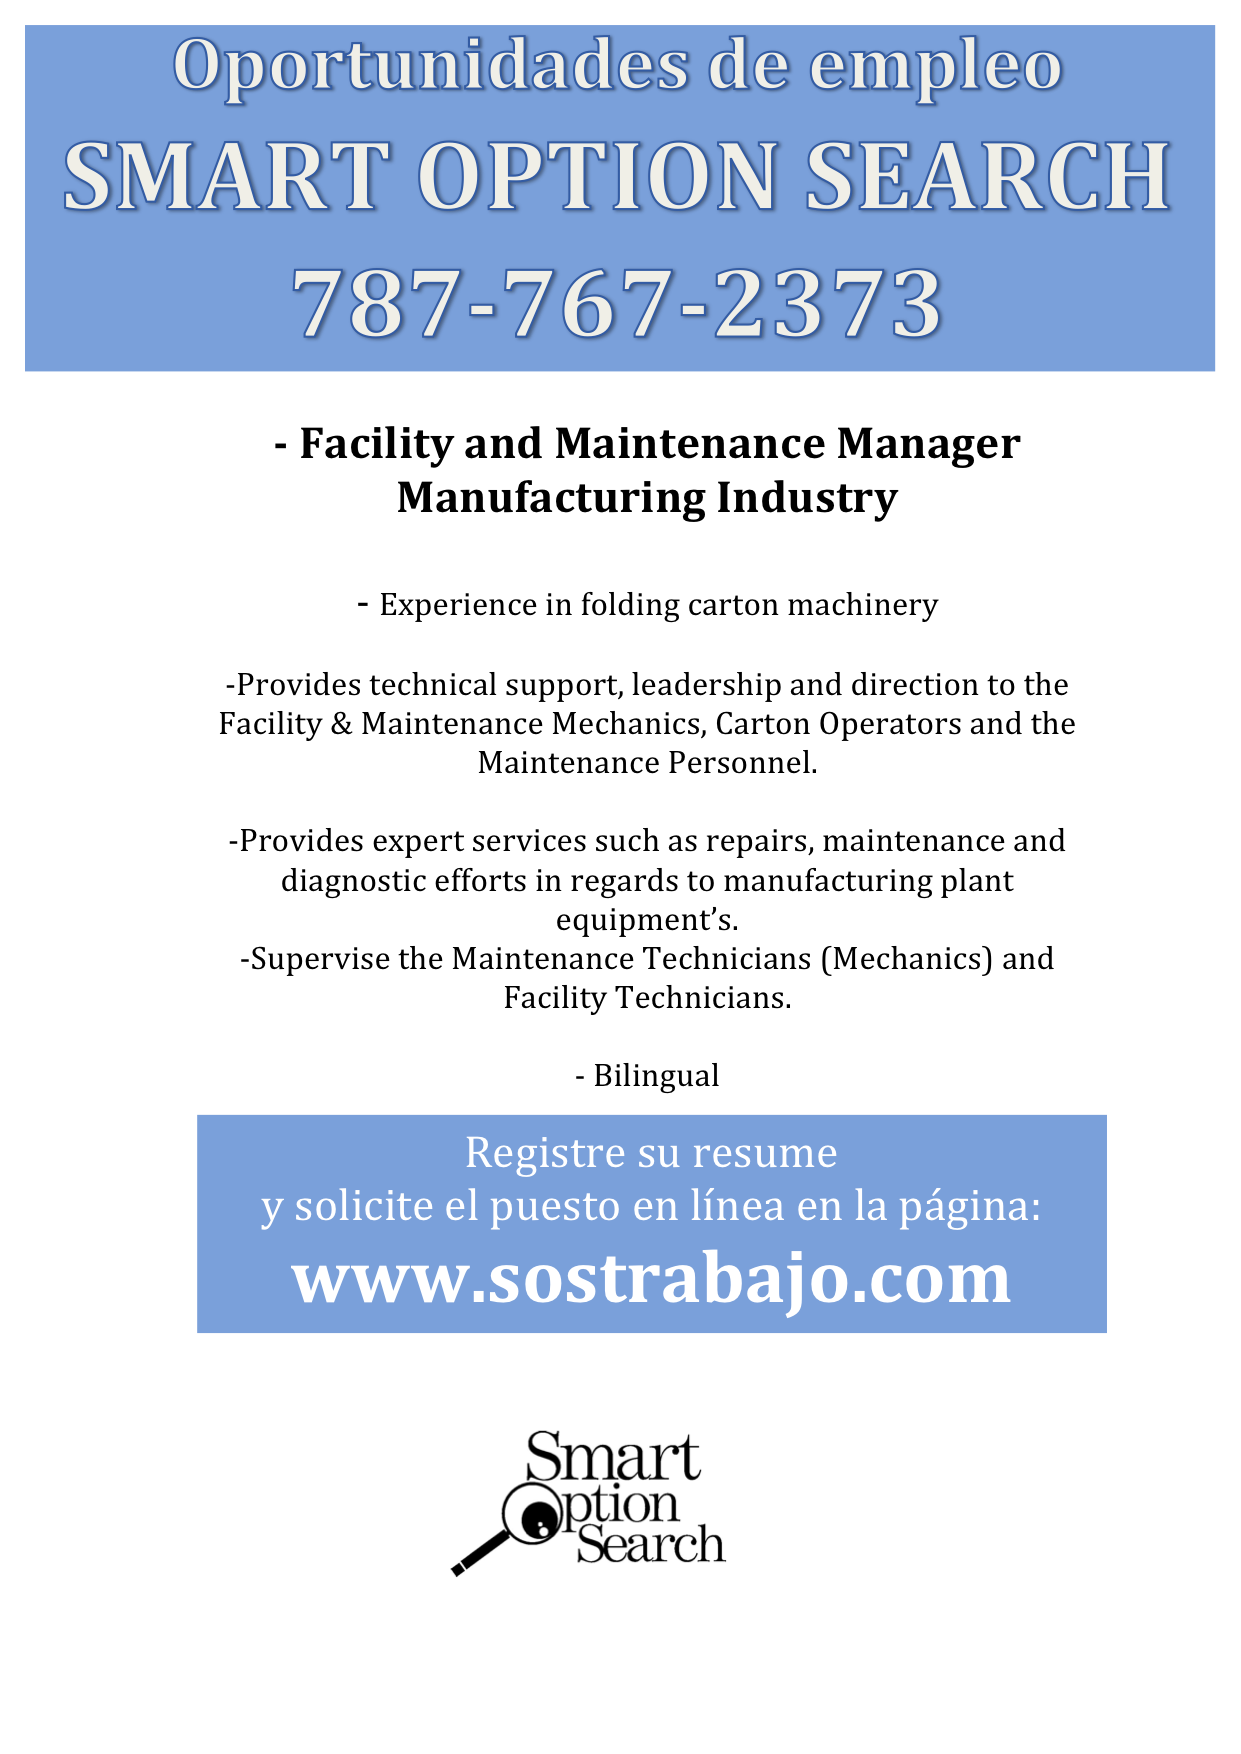 Facility Maintenance Manager Sample Resume Classy Empleosjobs Facility & Maintenance Managerresumes A Franjen .